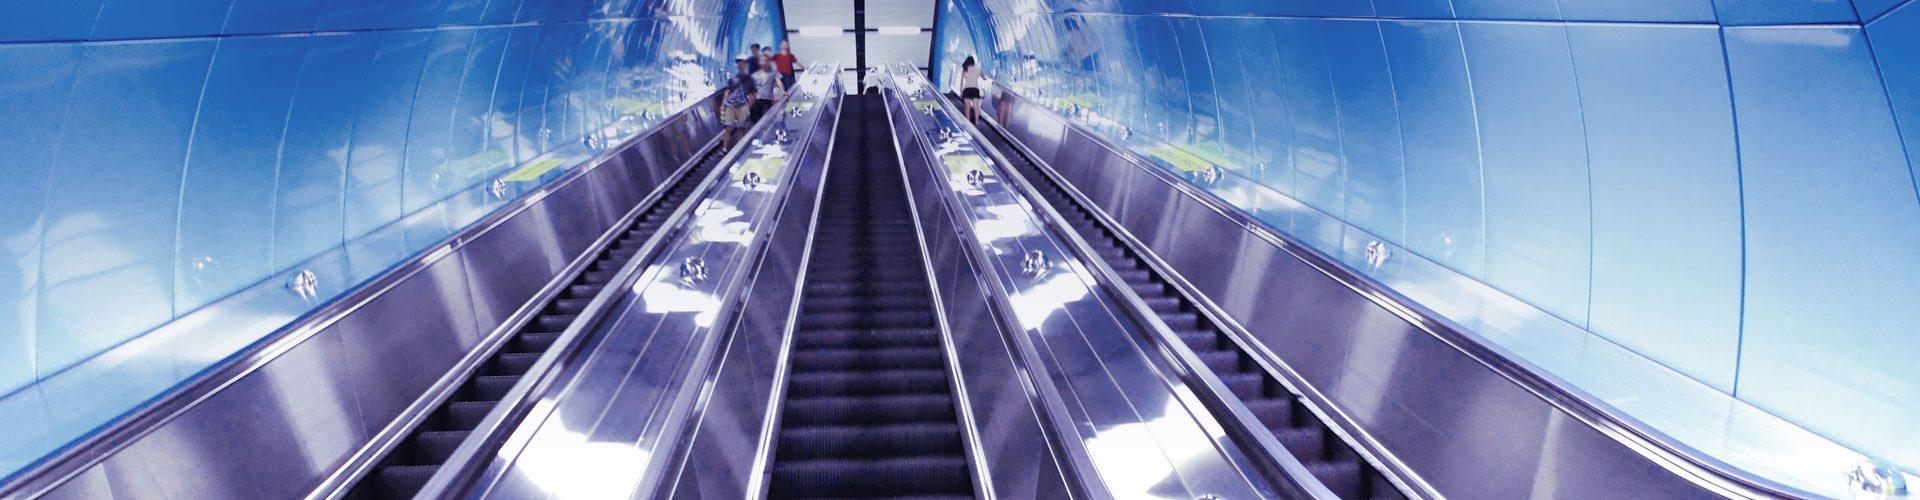 Rolltreppe U-Bahn